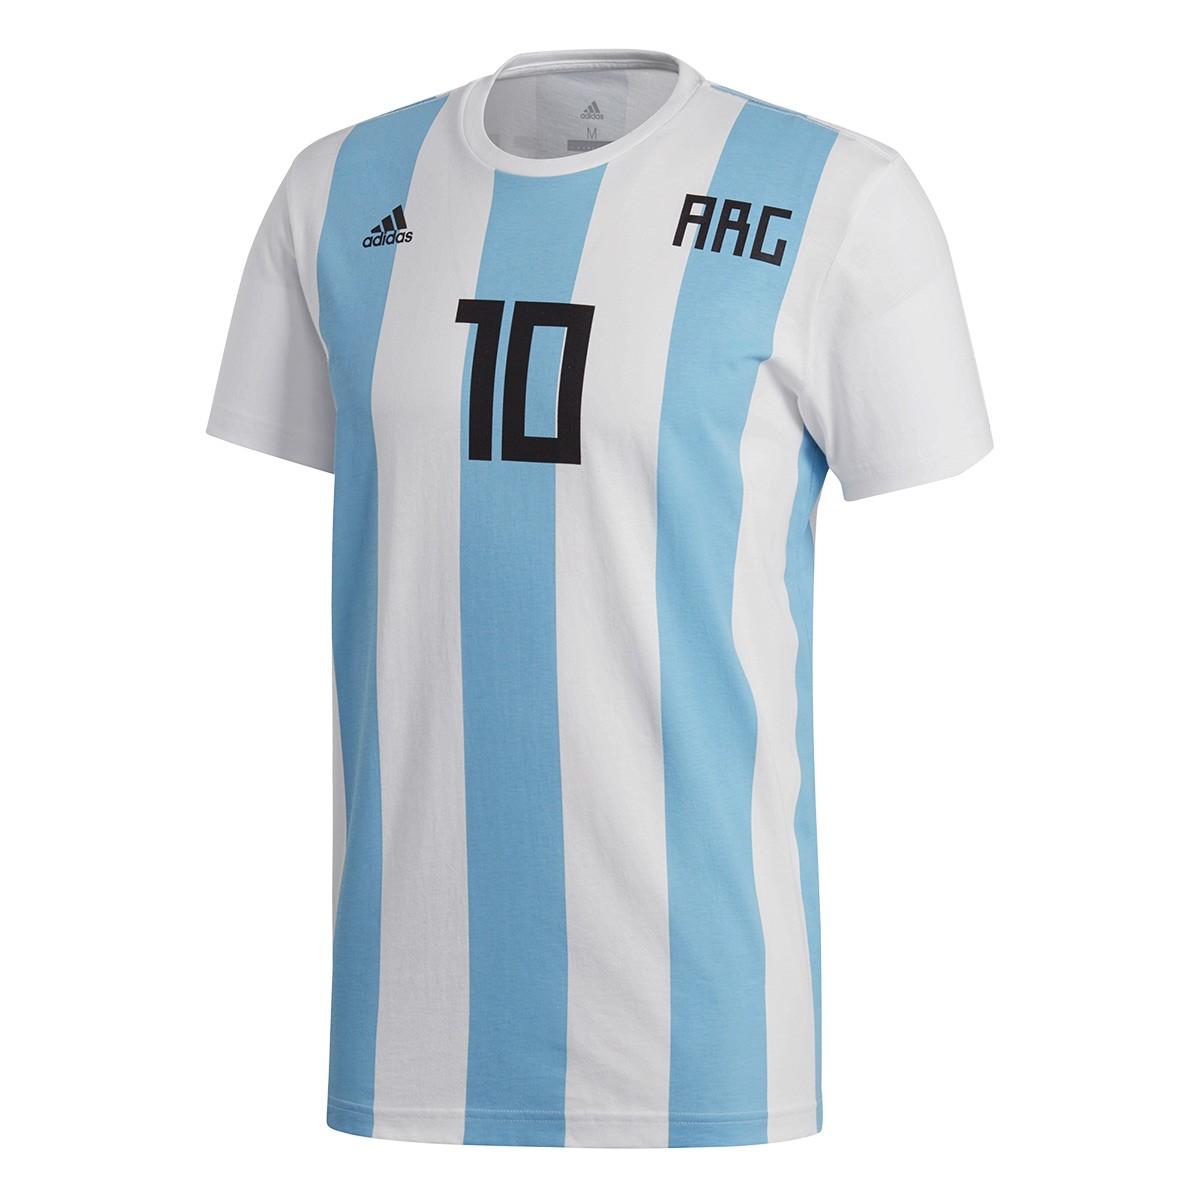 e9289b173d0b0 Playera adidas Messi Argentina 2017-2018 White - Tienda de fútbol Fútbol  Emotion